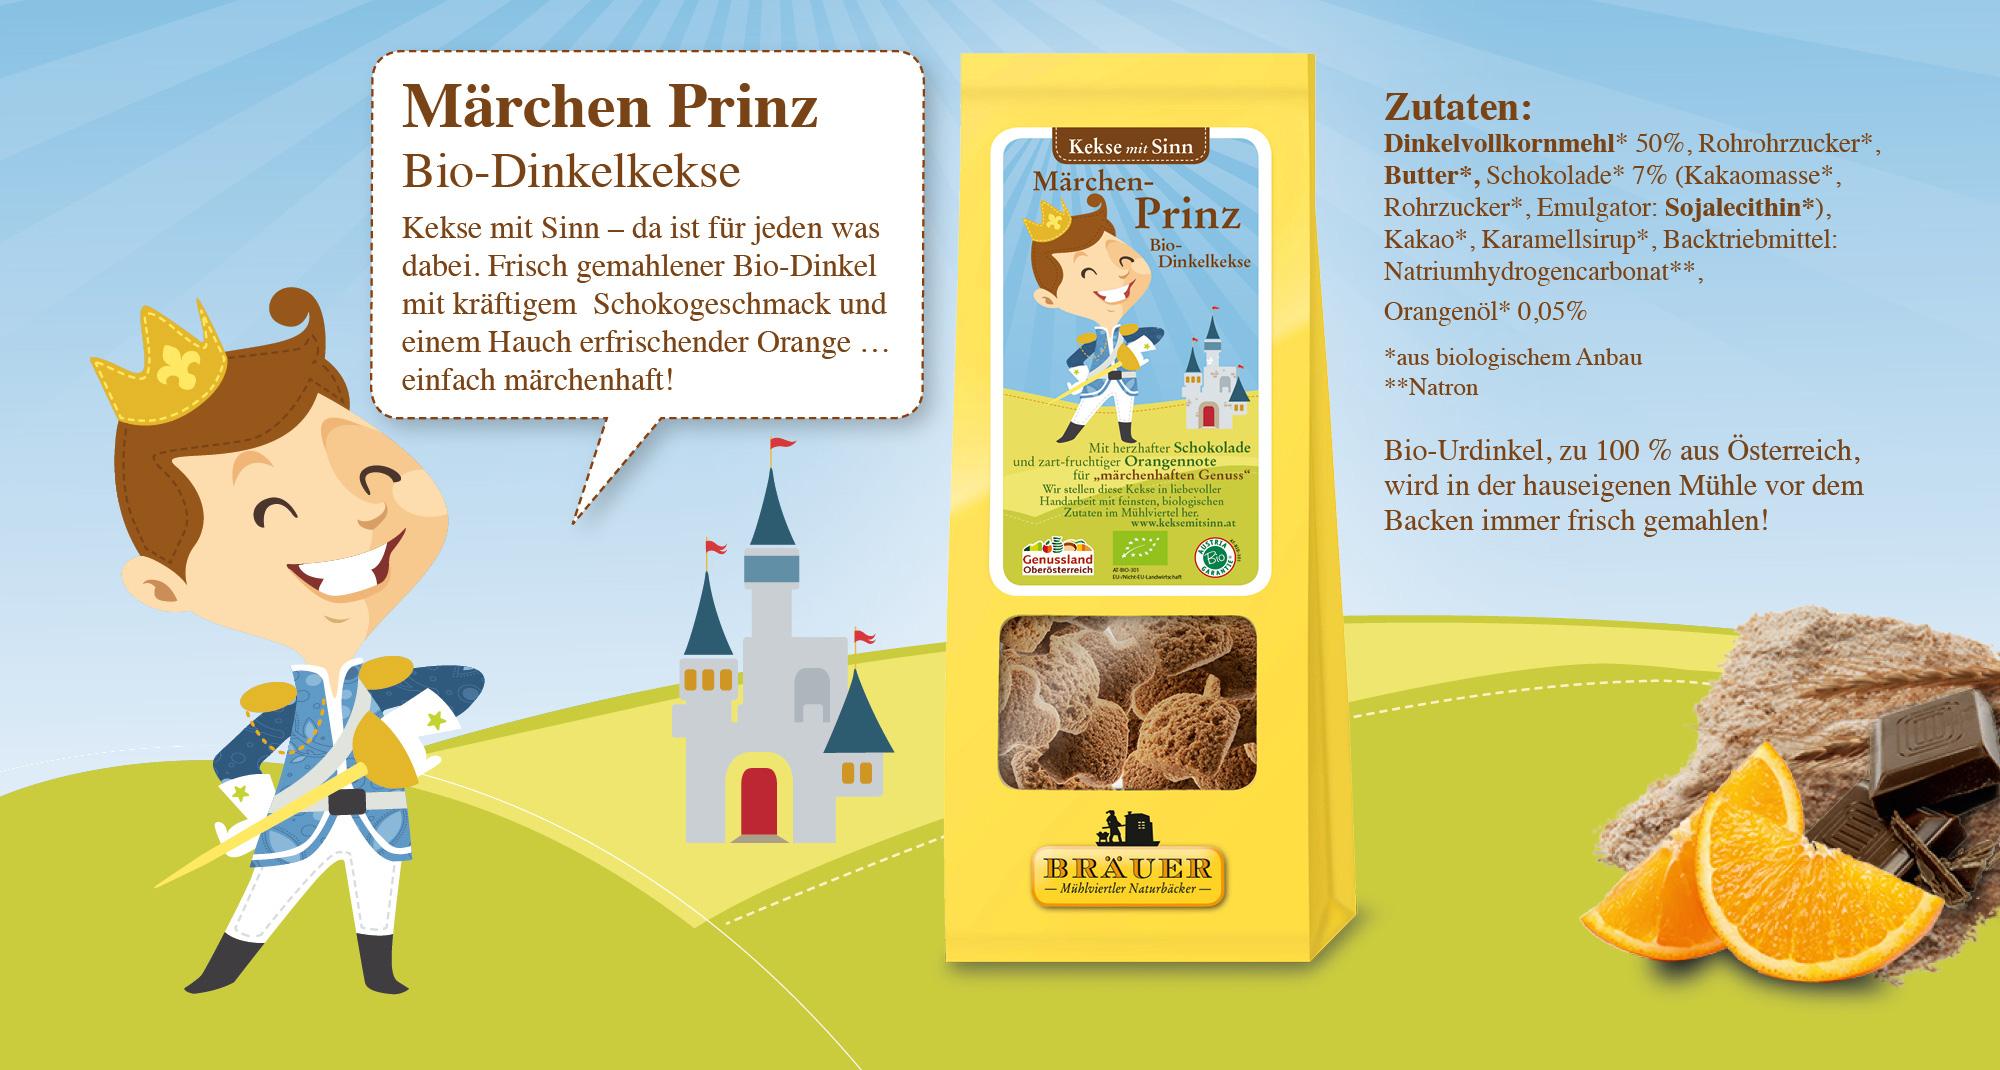 KmS Märchen Prinz